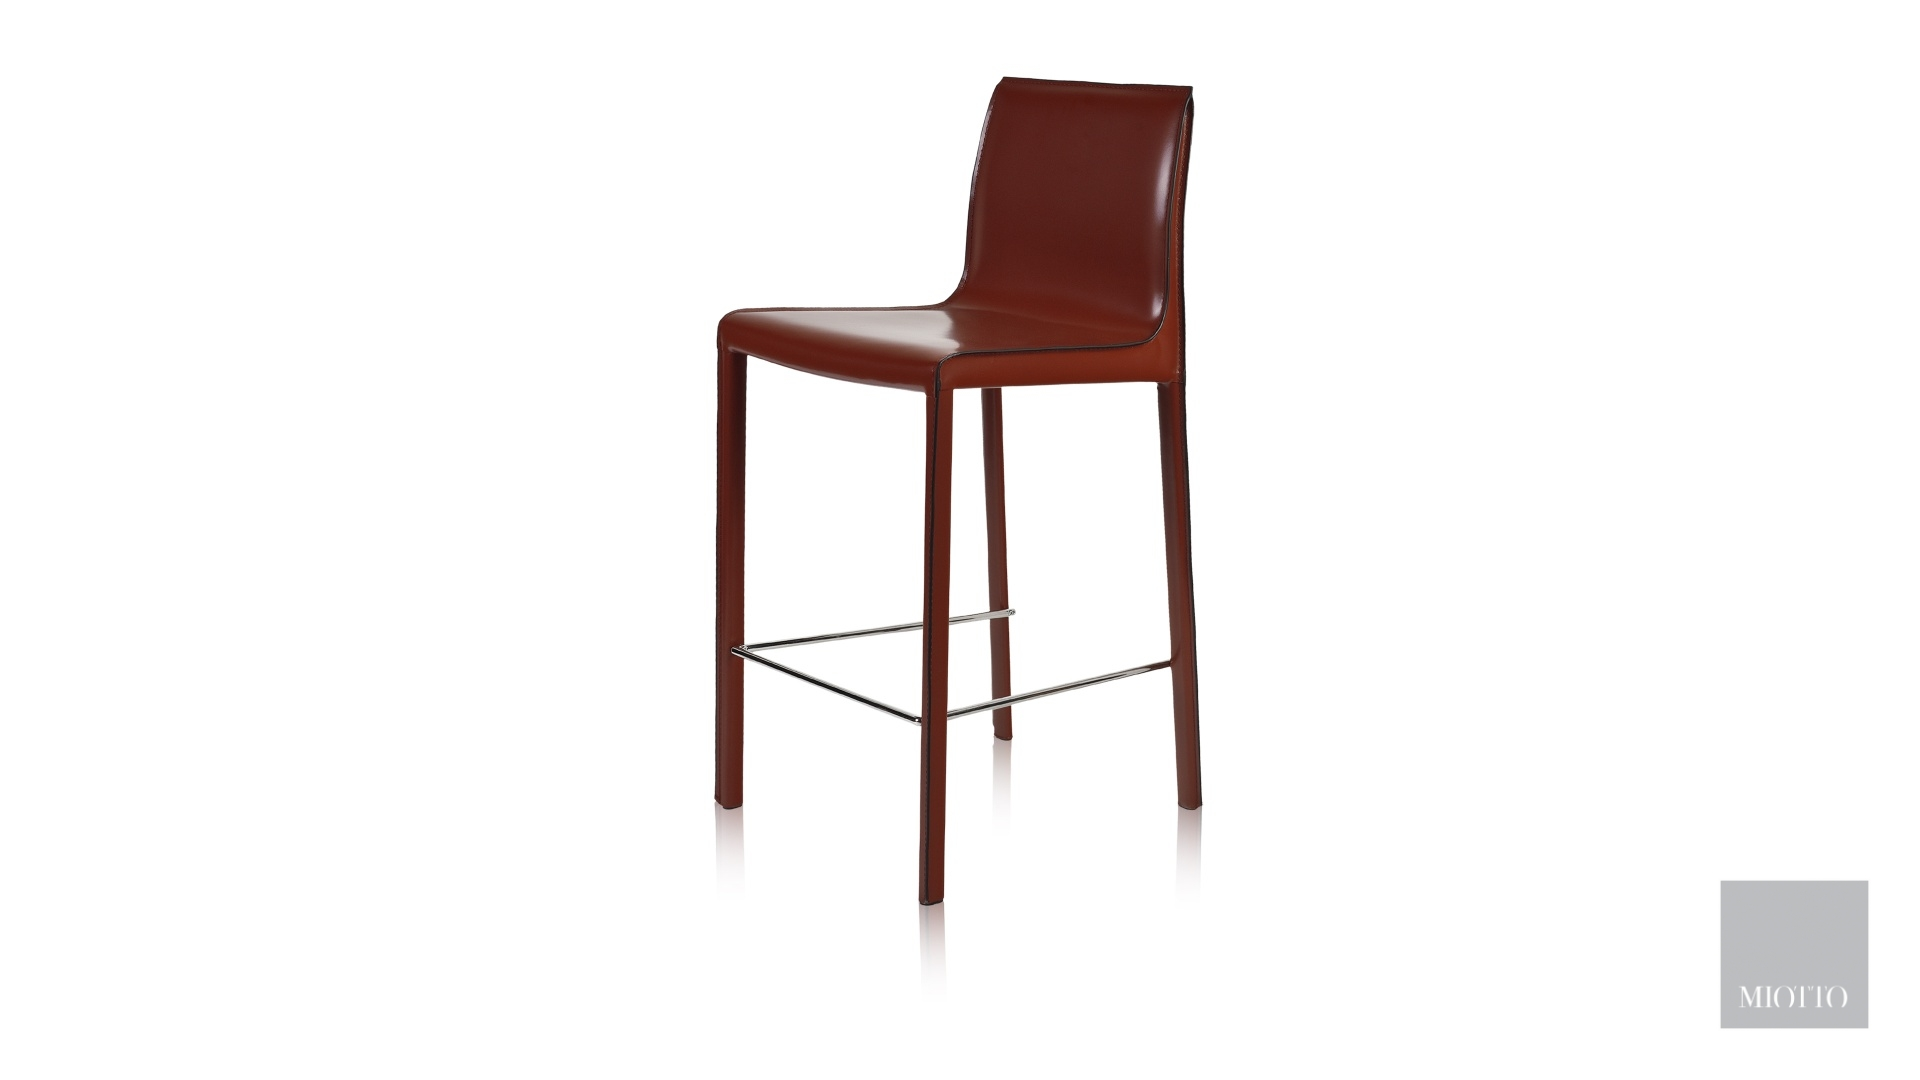 miotto_Ardini bar stool burgundy miotto furniture t